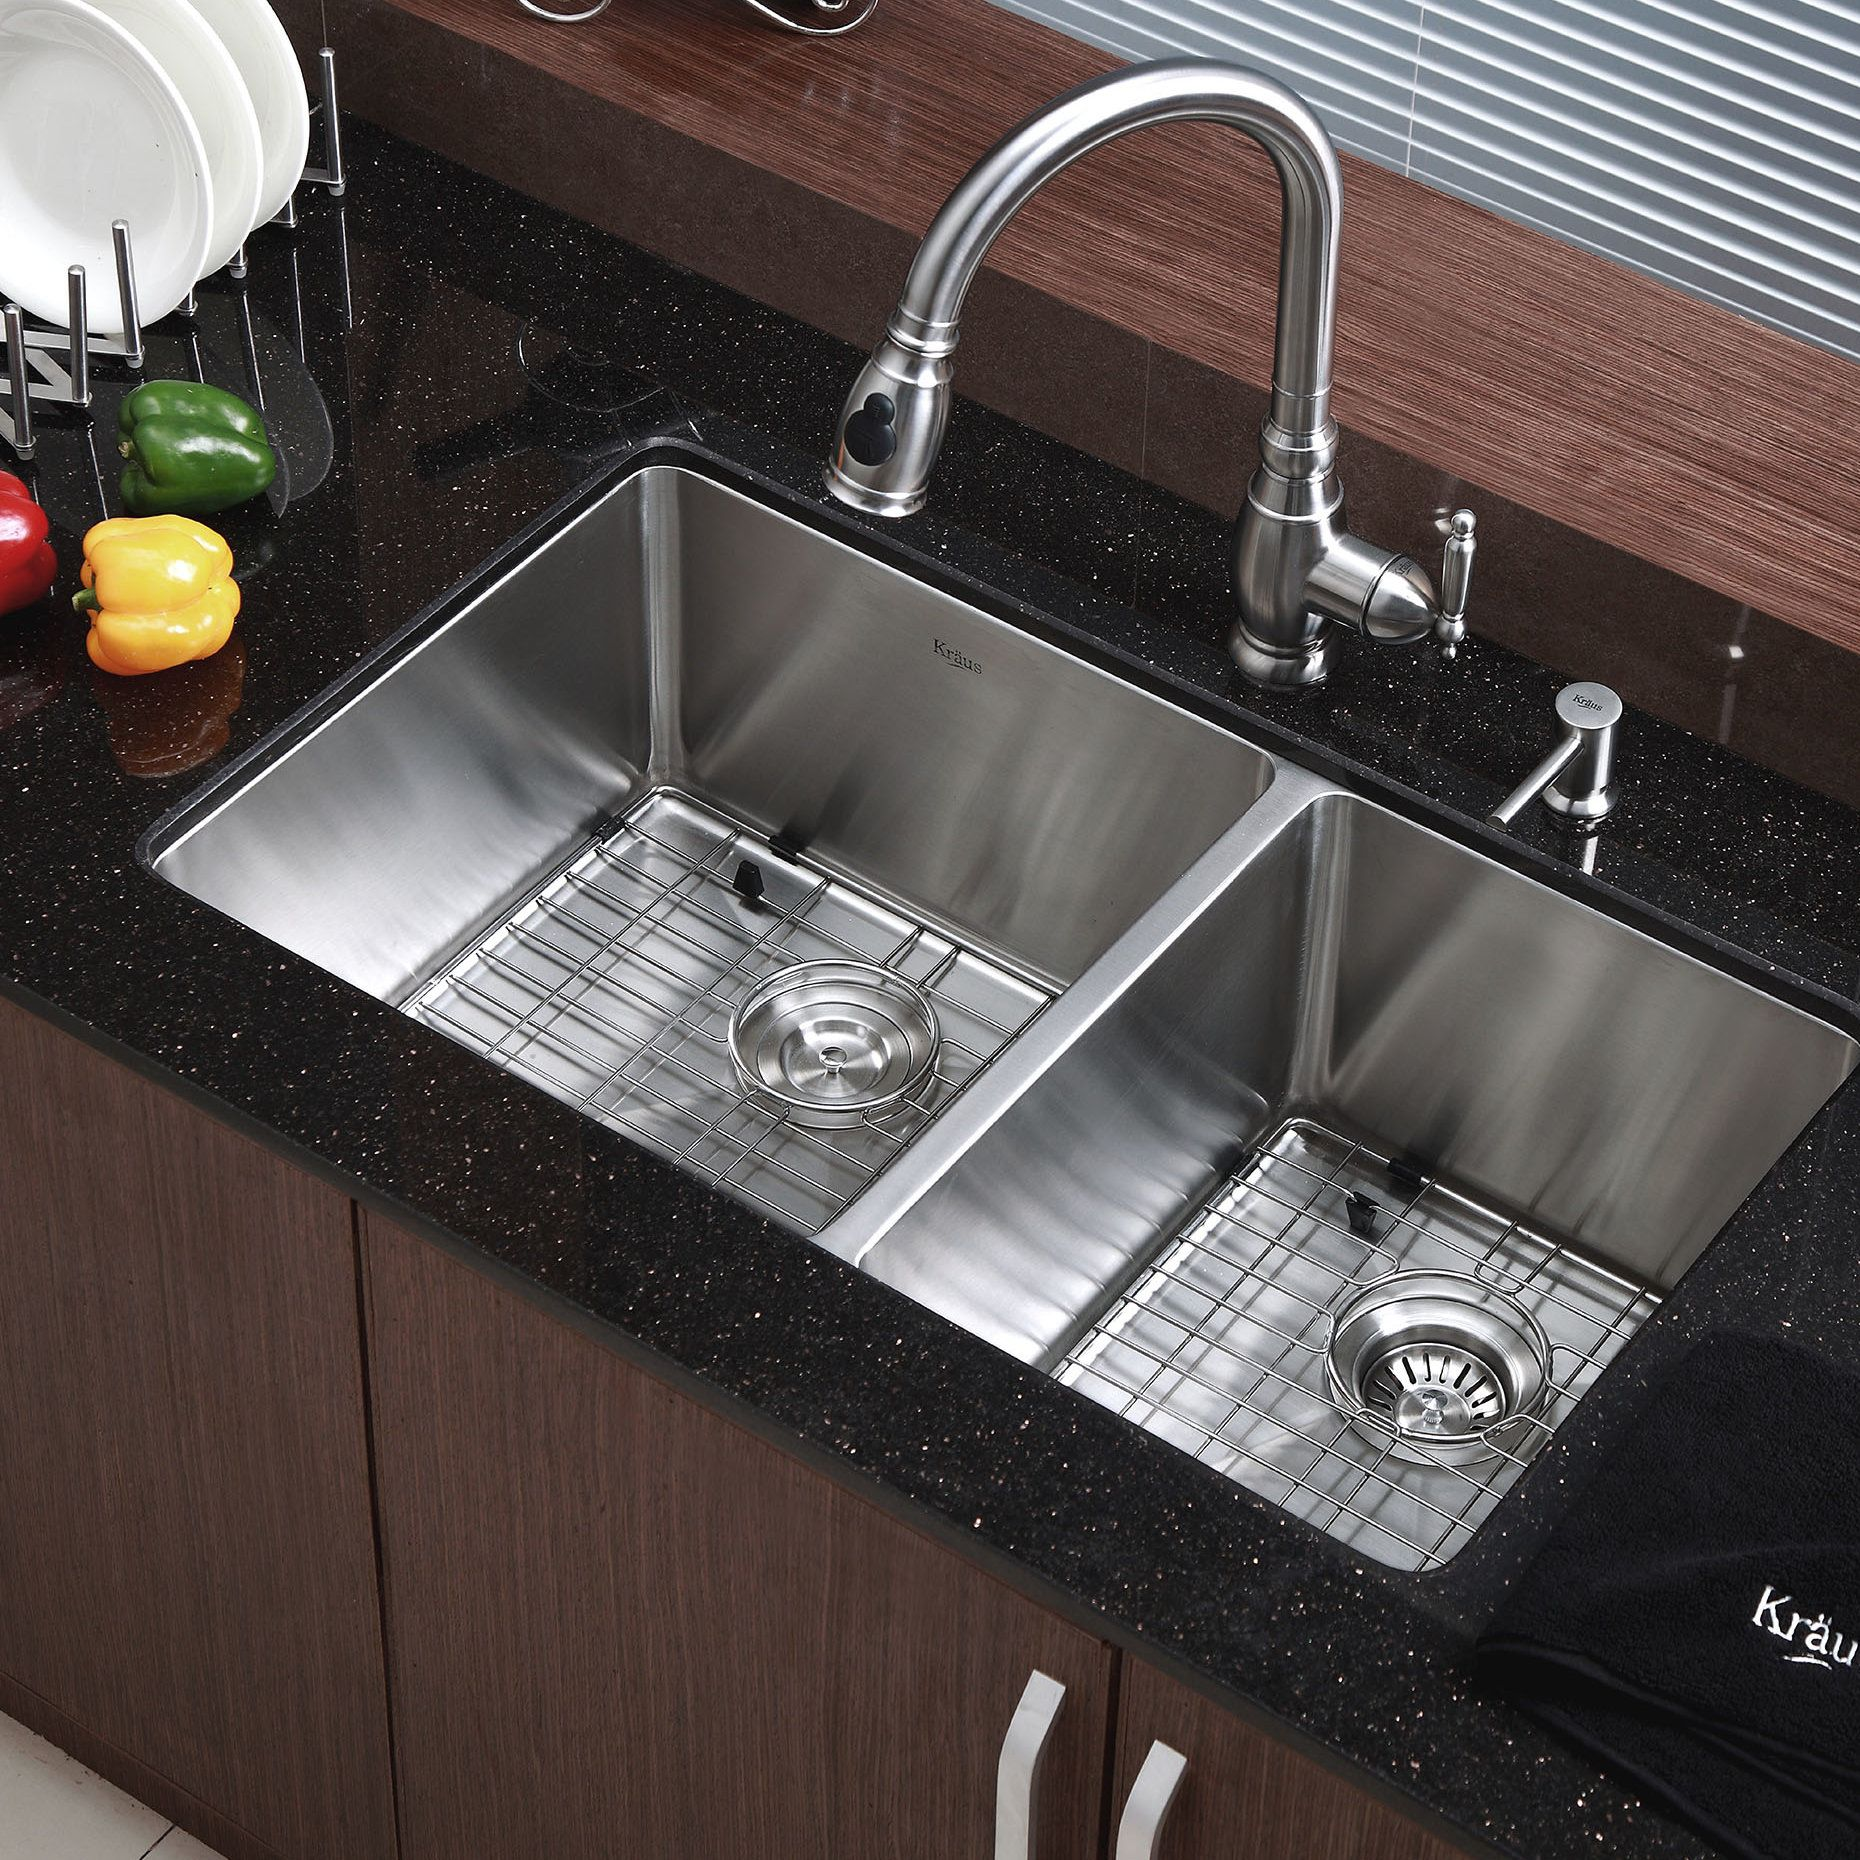 33 L X 19 W Double Basin Undermount Kitchen Sink With Drain